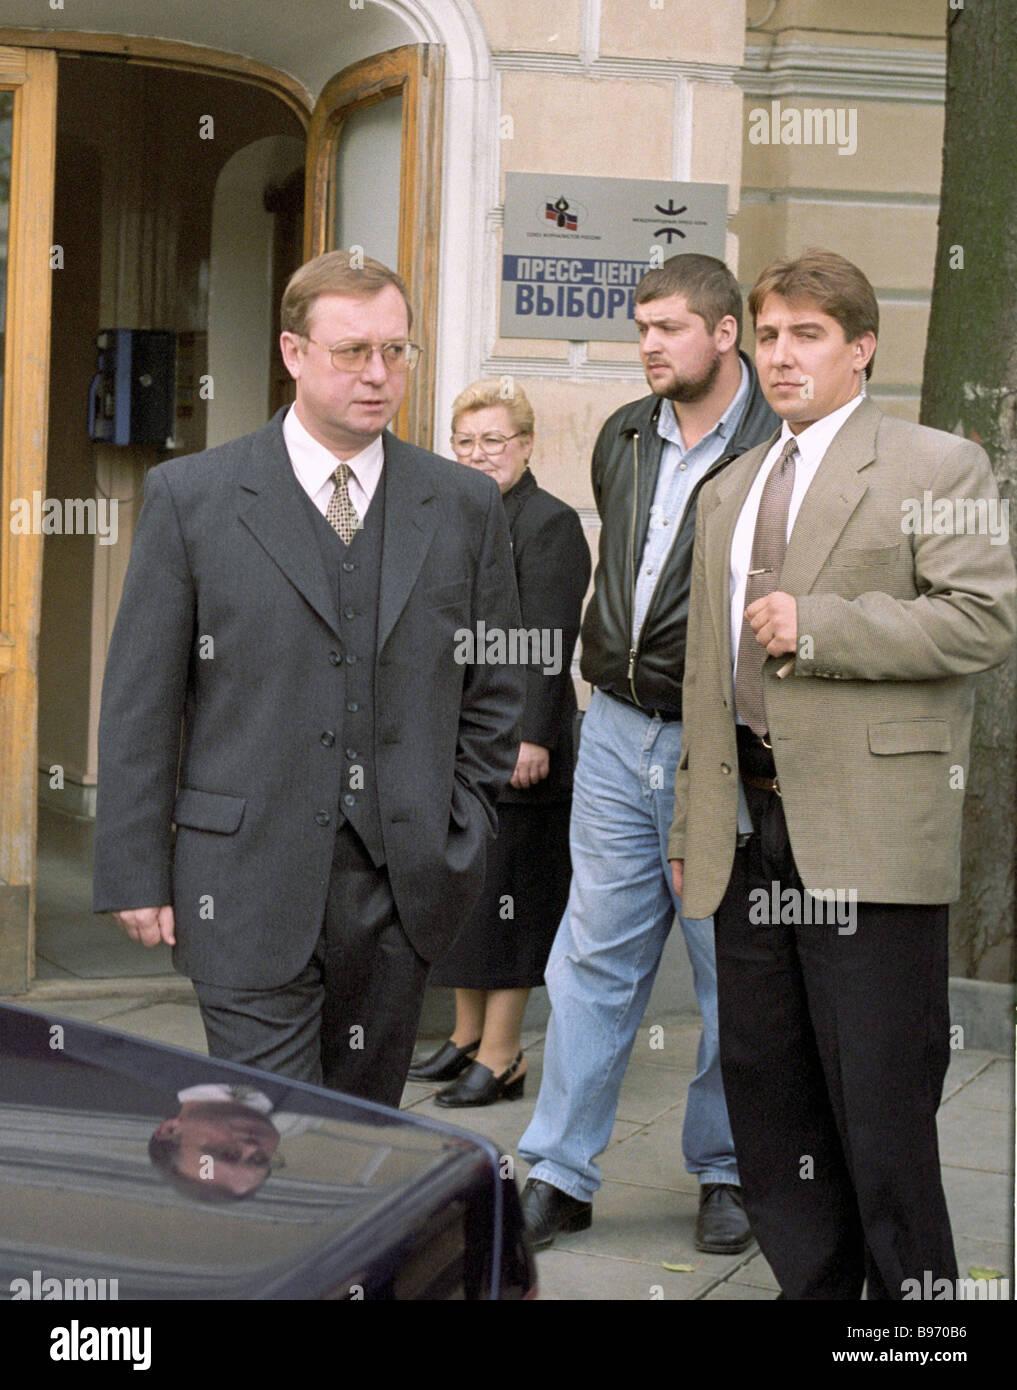 One of Yabloko political faction leaders Sergei Stepashin left - Stock Image